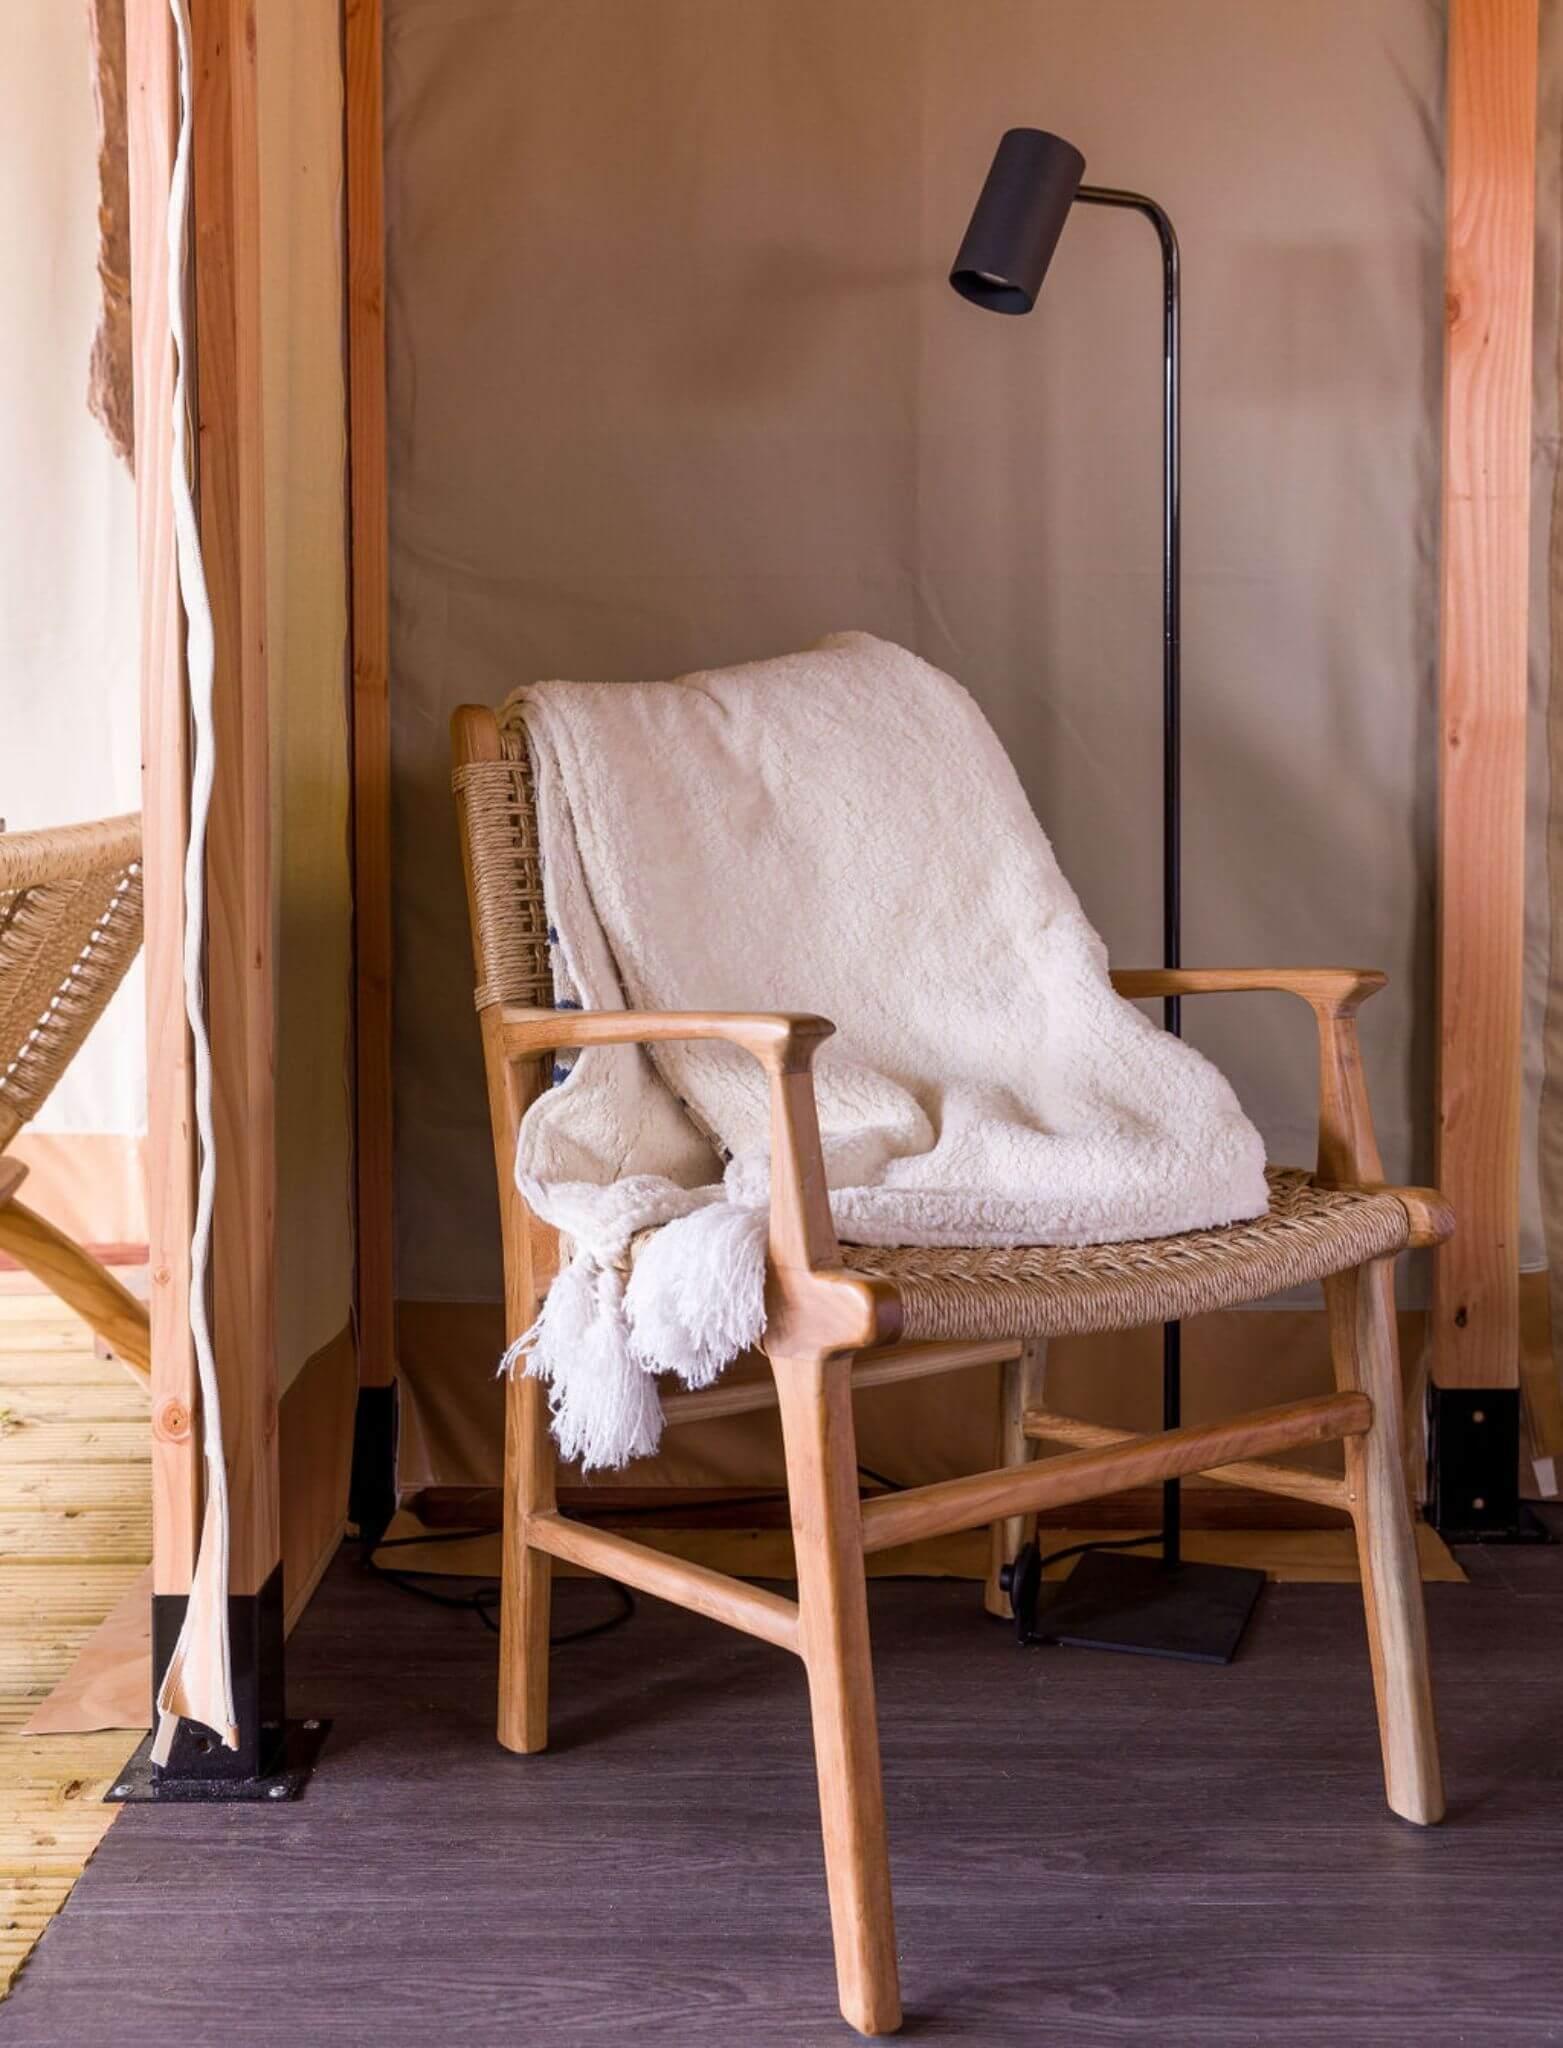 YALA_chair_interior_Lush